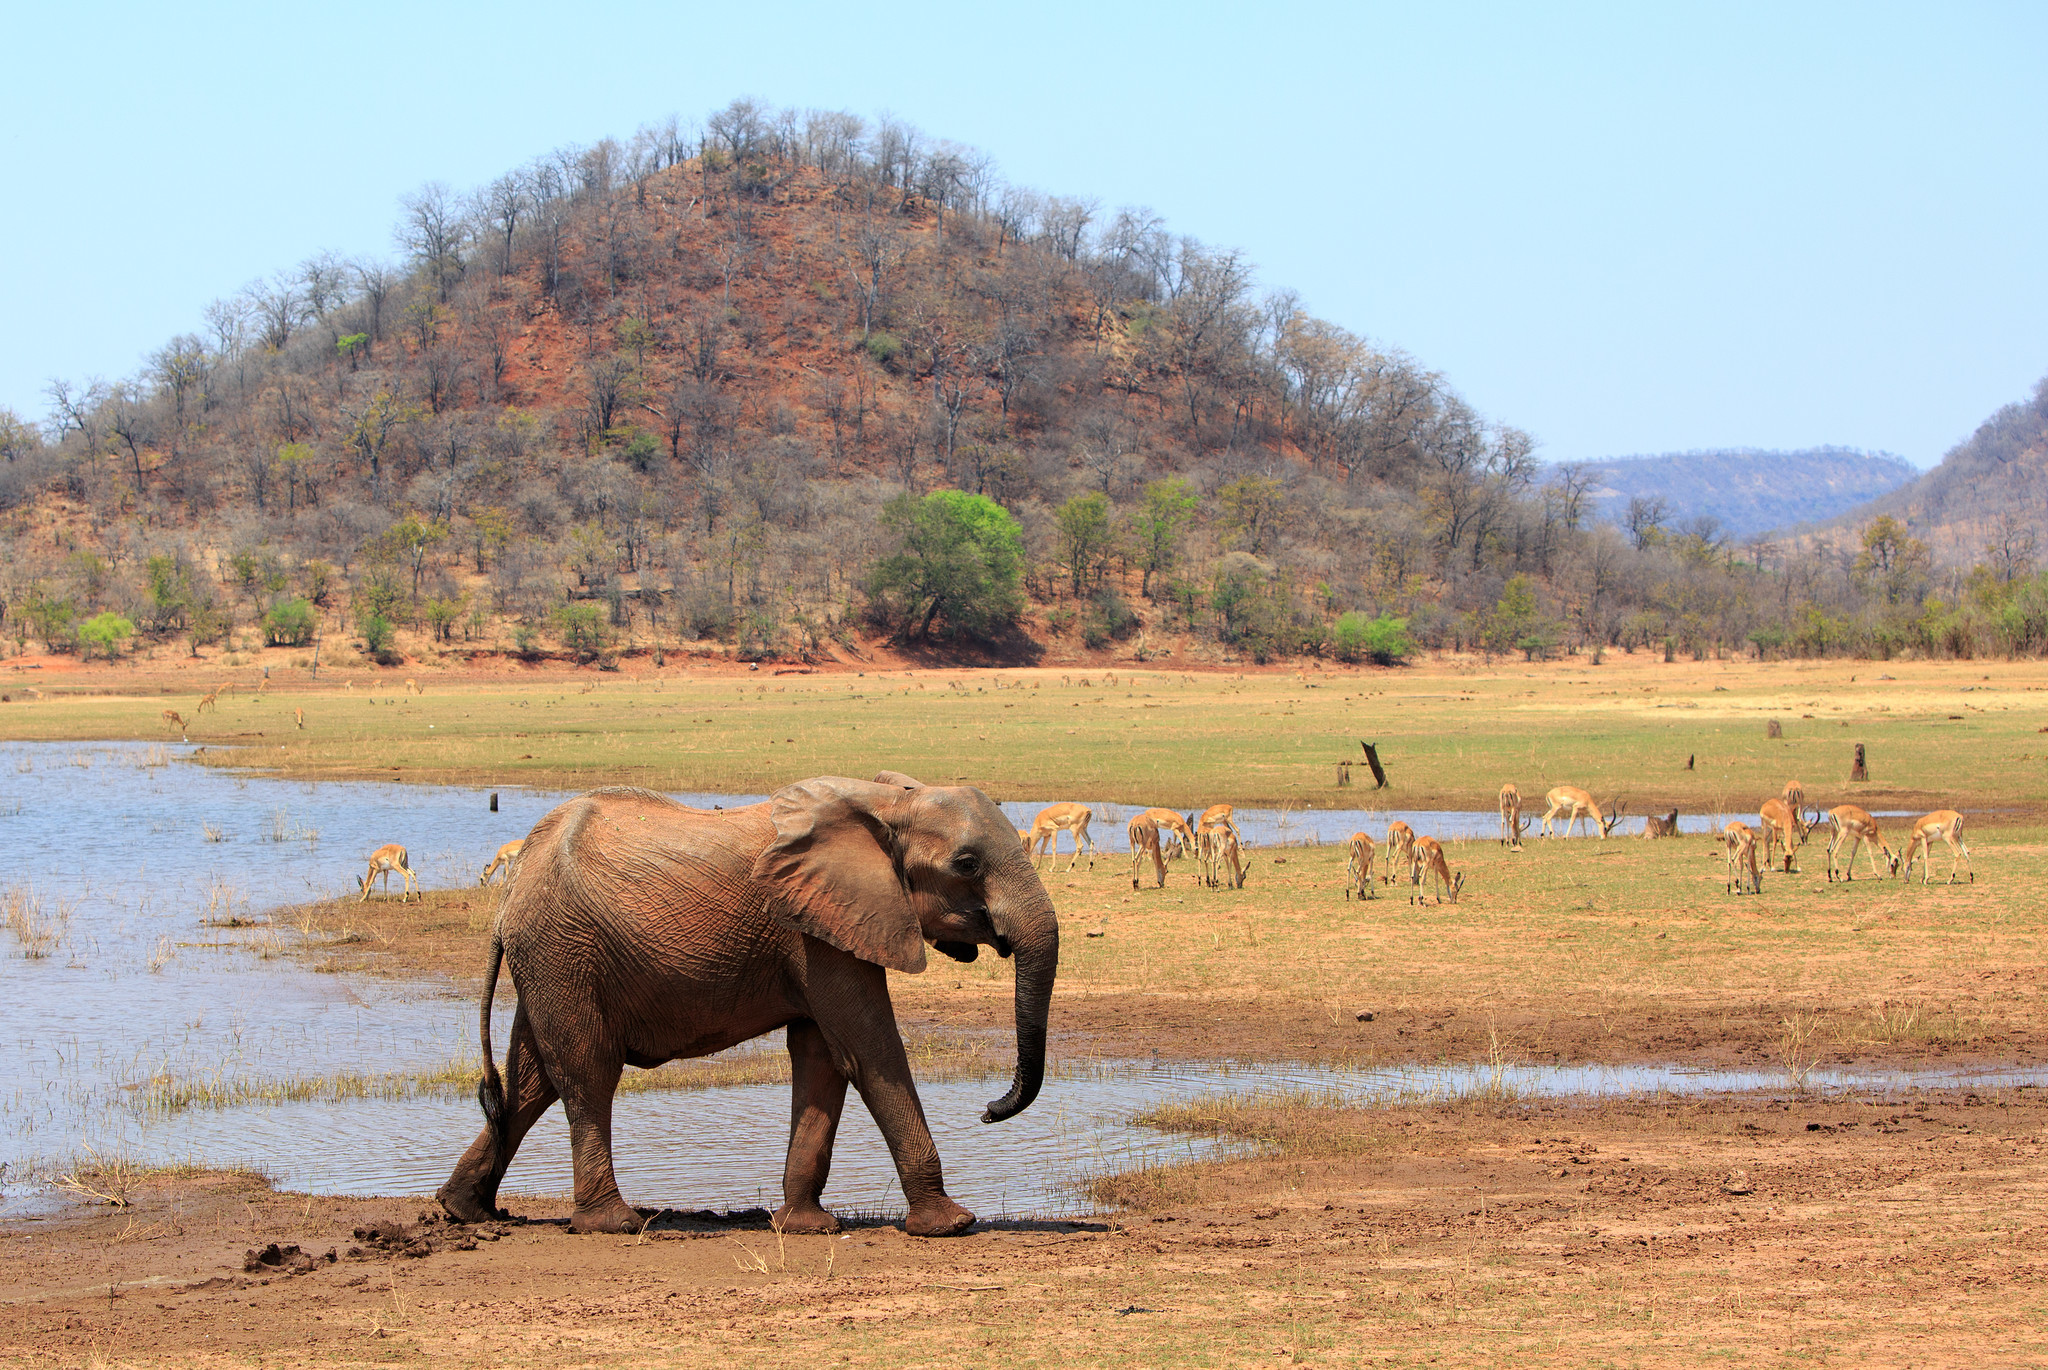 Zimbabwe park rangers drown after poachers overpower them